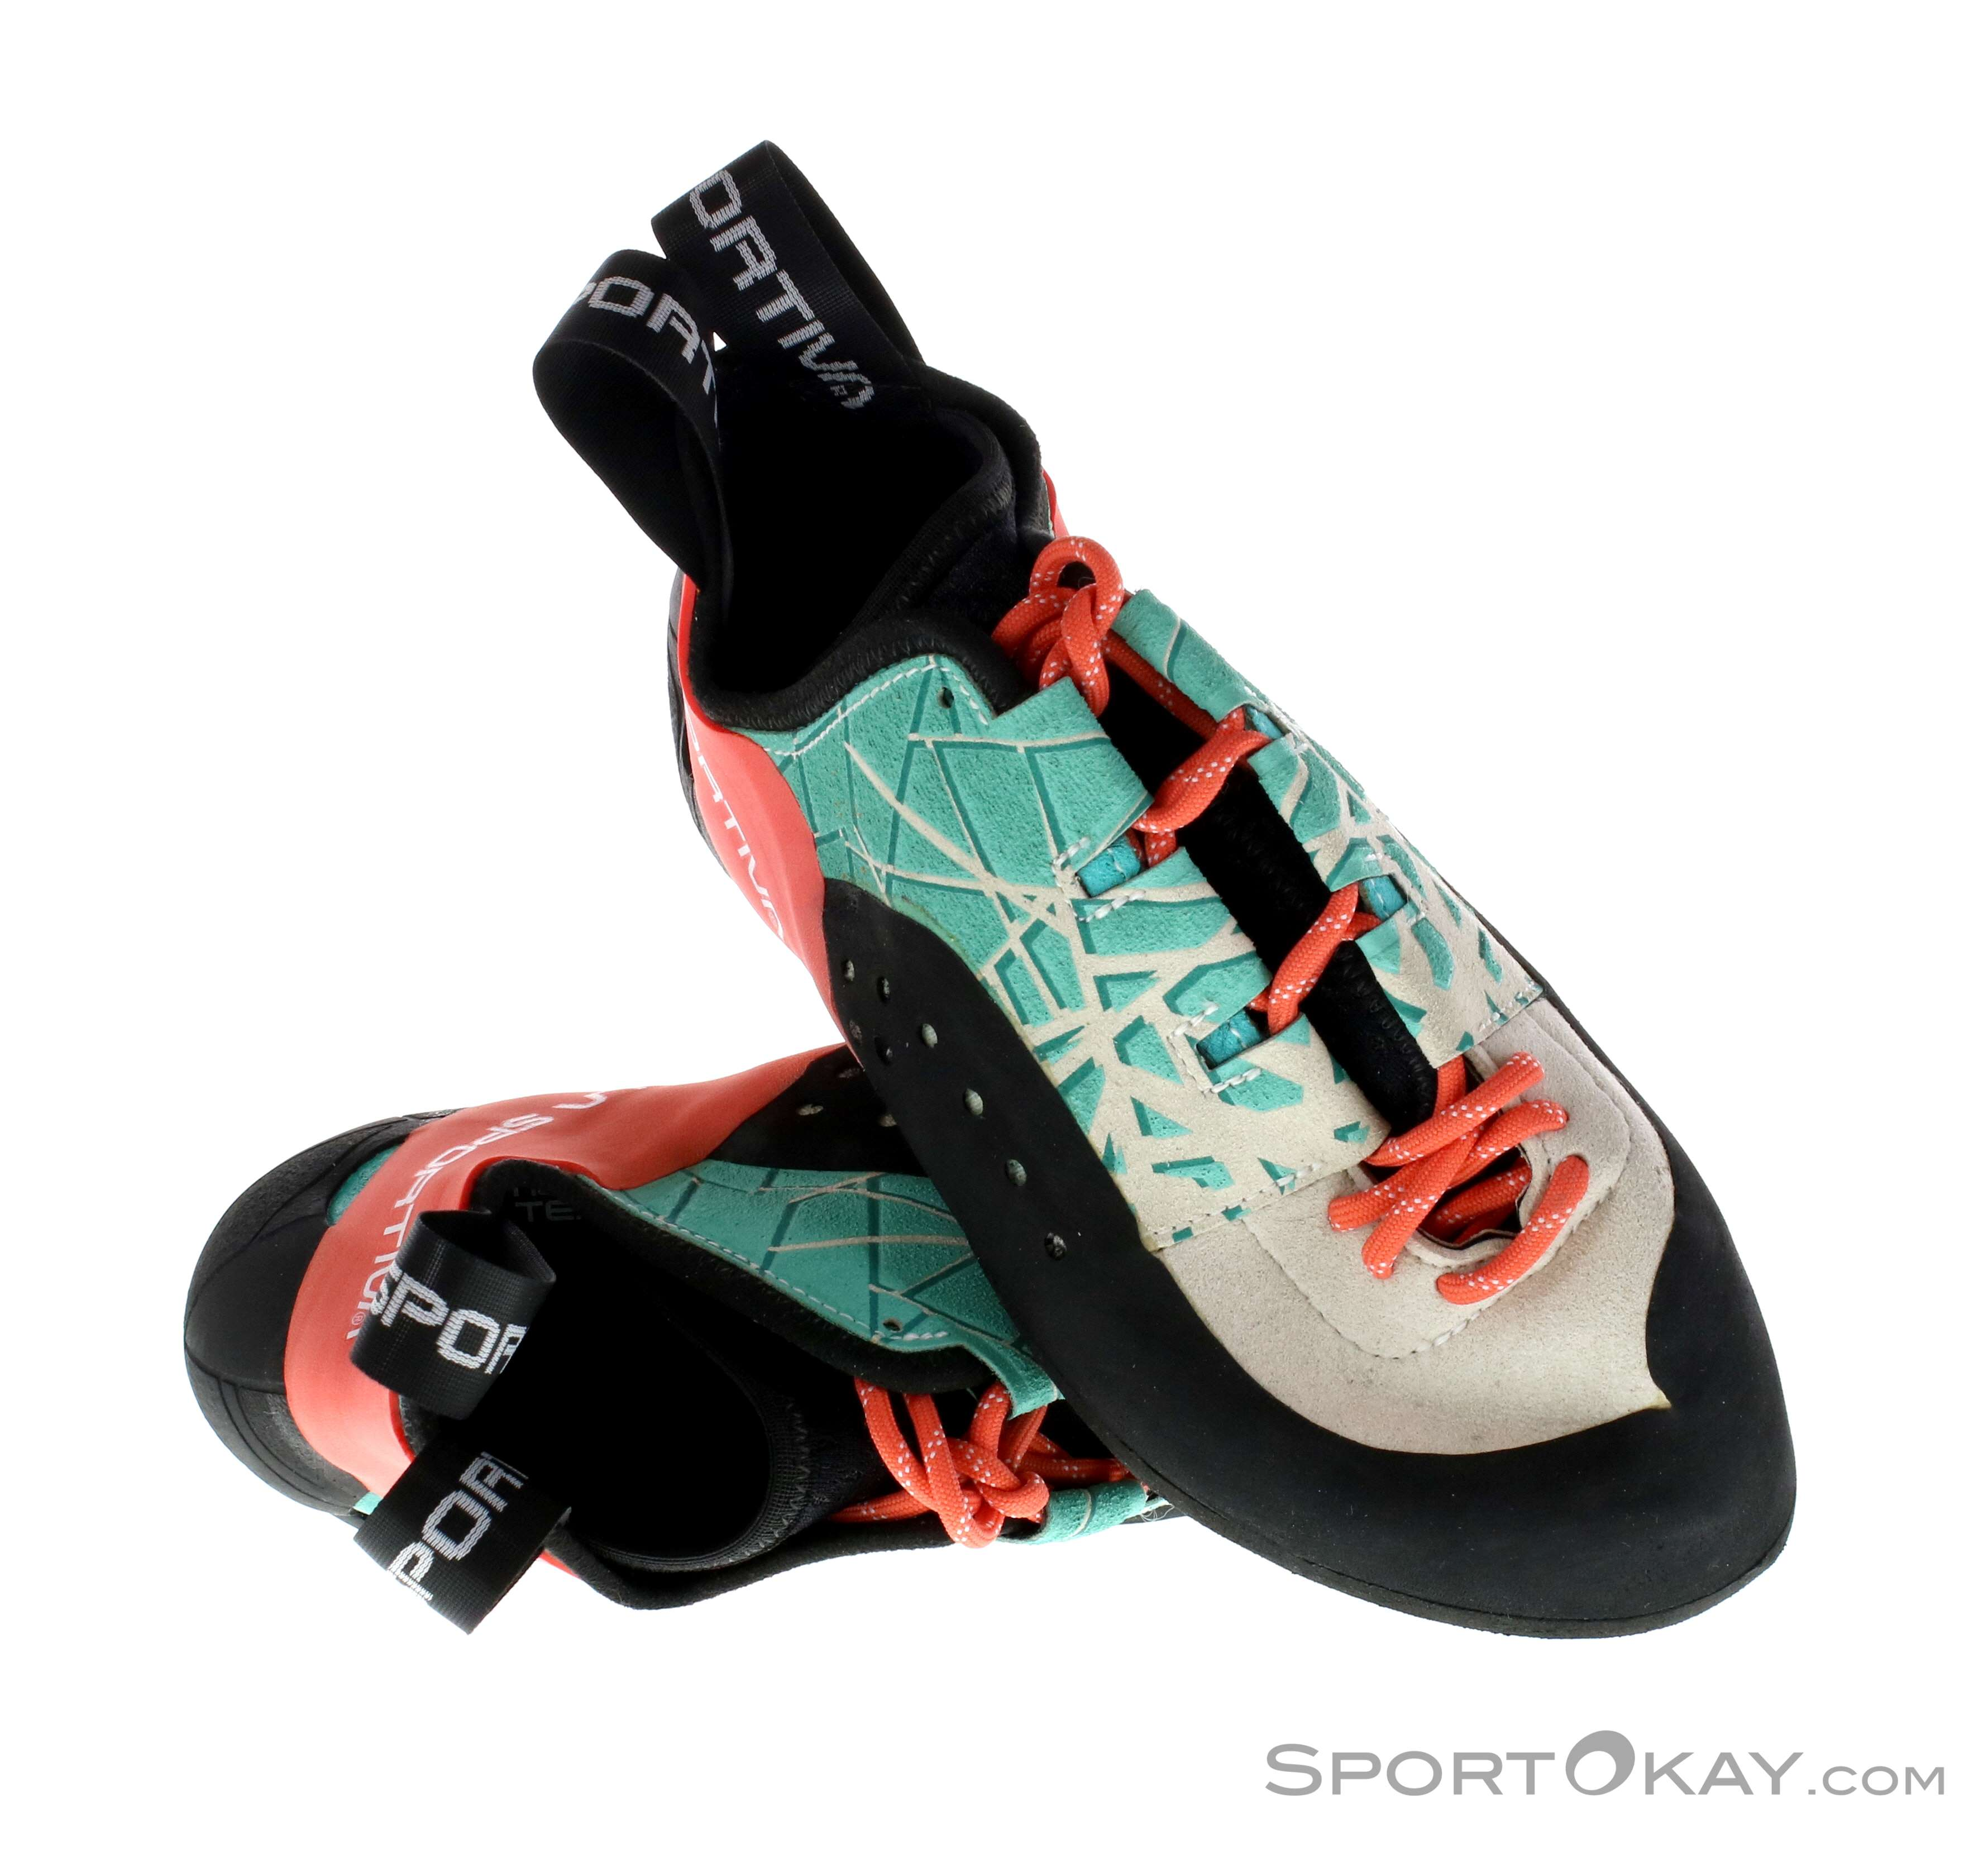 aaa90ab37cbc La Sportiva Kataki Womens Climbing Shoes - Lace-Up Shoes - Climbing ...